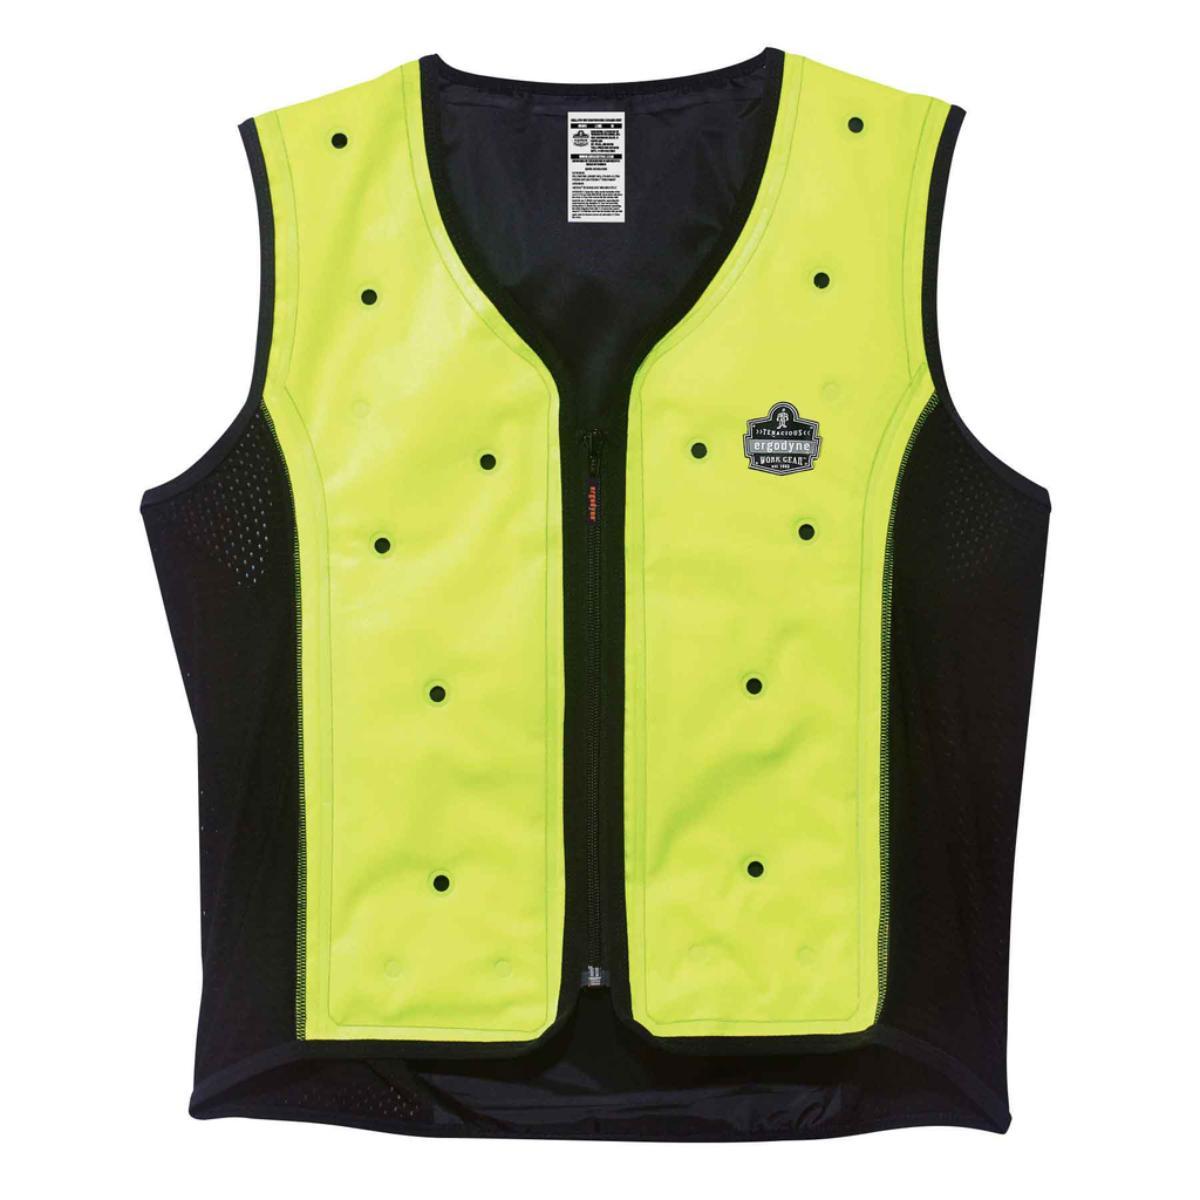 6685 M Lime Dry Evaporative Cooling Vest